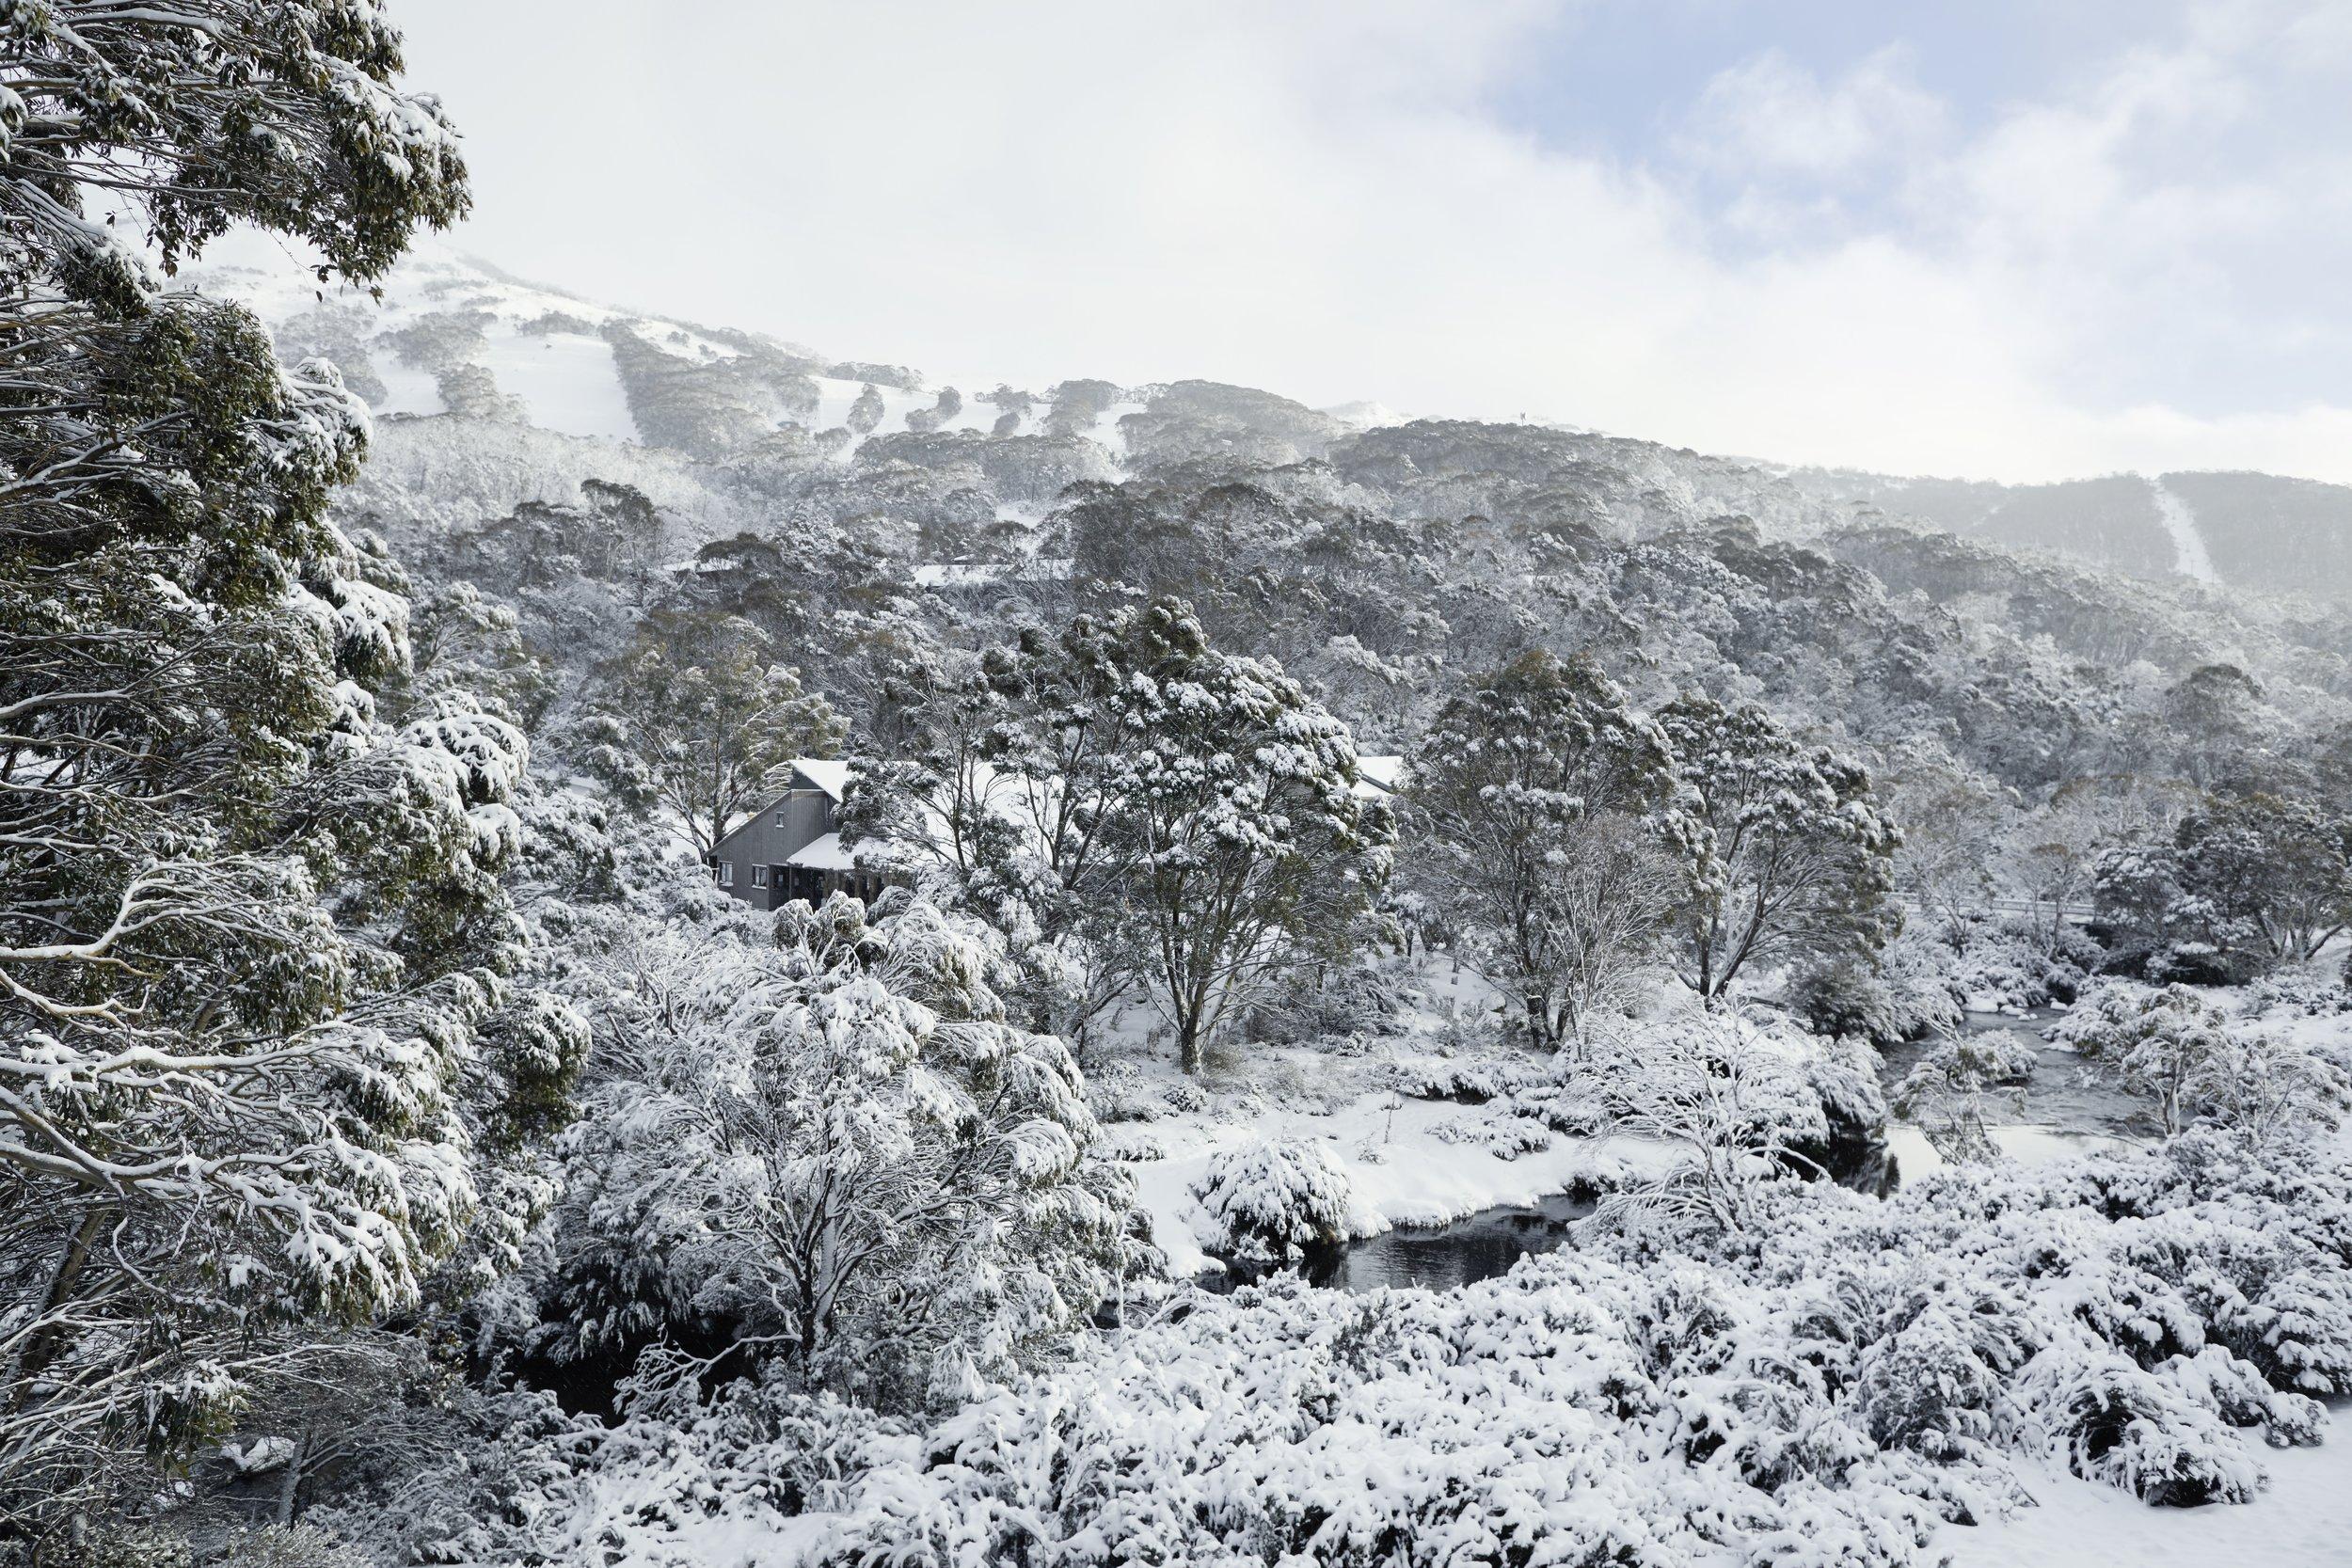 The magical view of Mount Kosciuszko from  The Eastern  at Thredbo Village. Photo - Monique Easton.